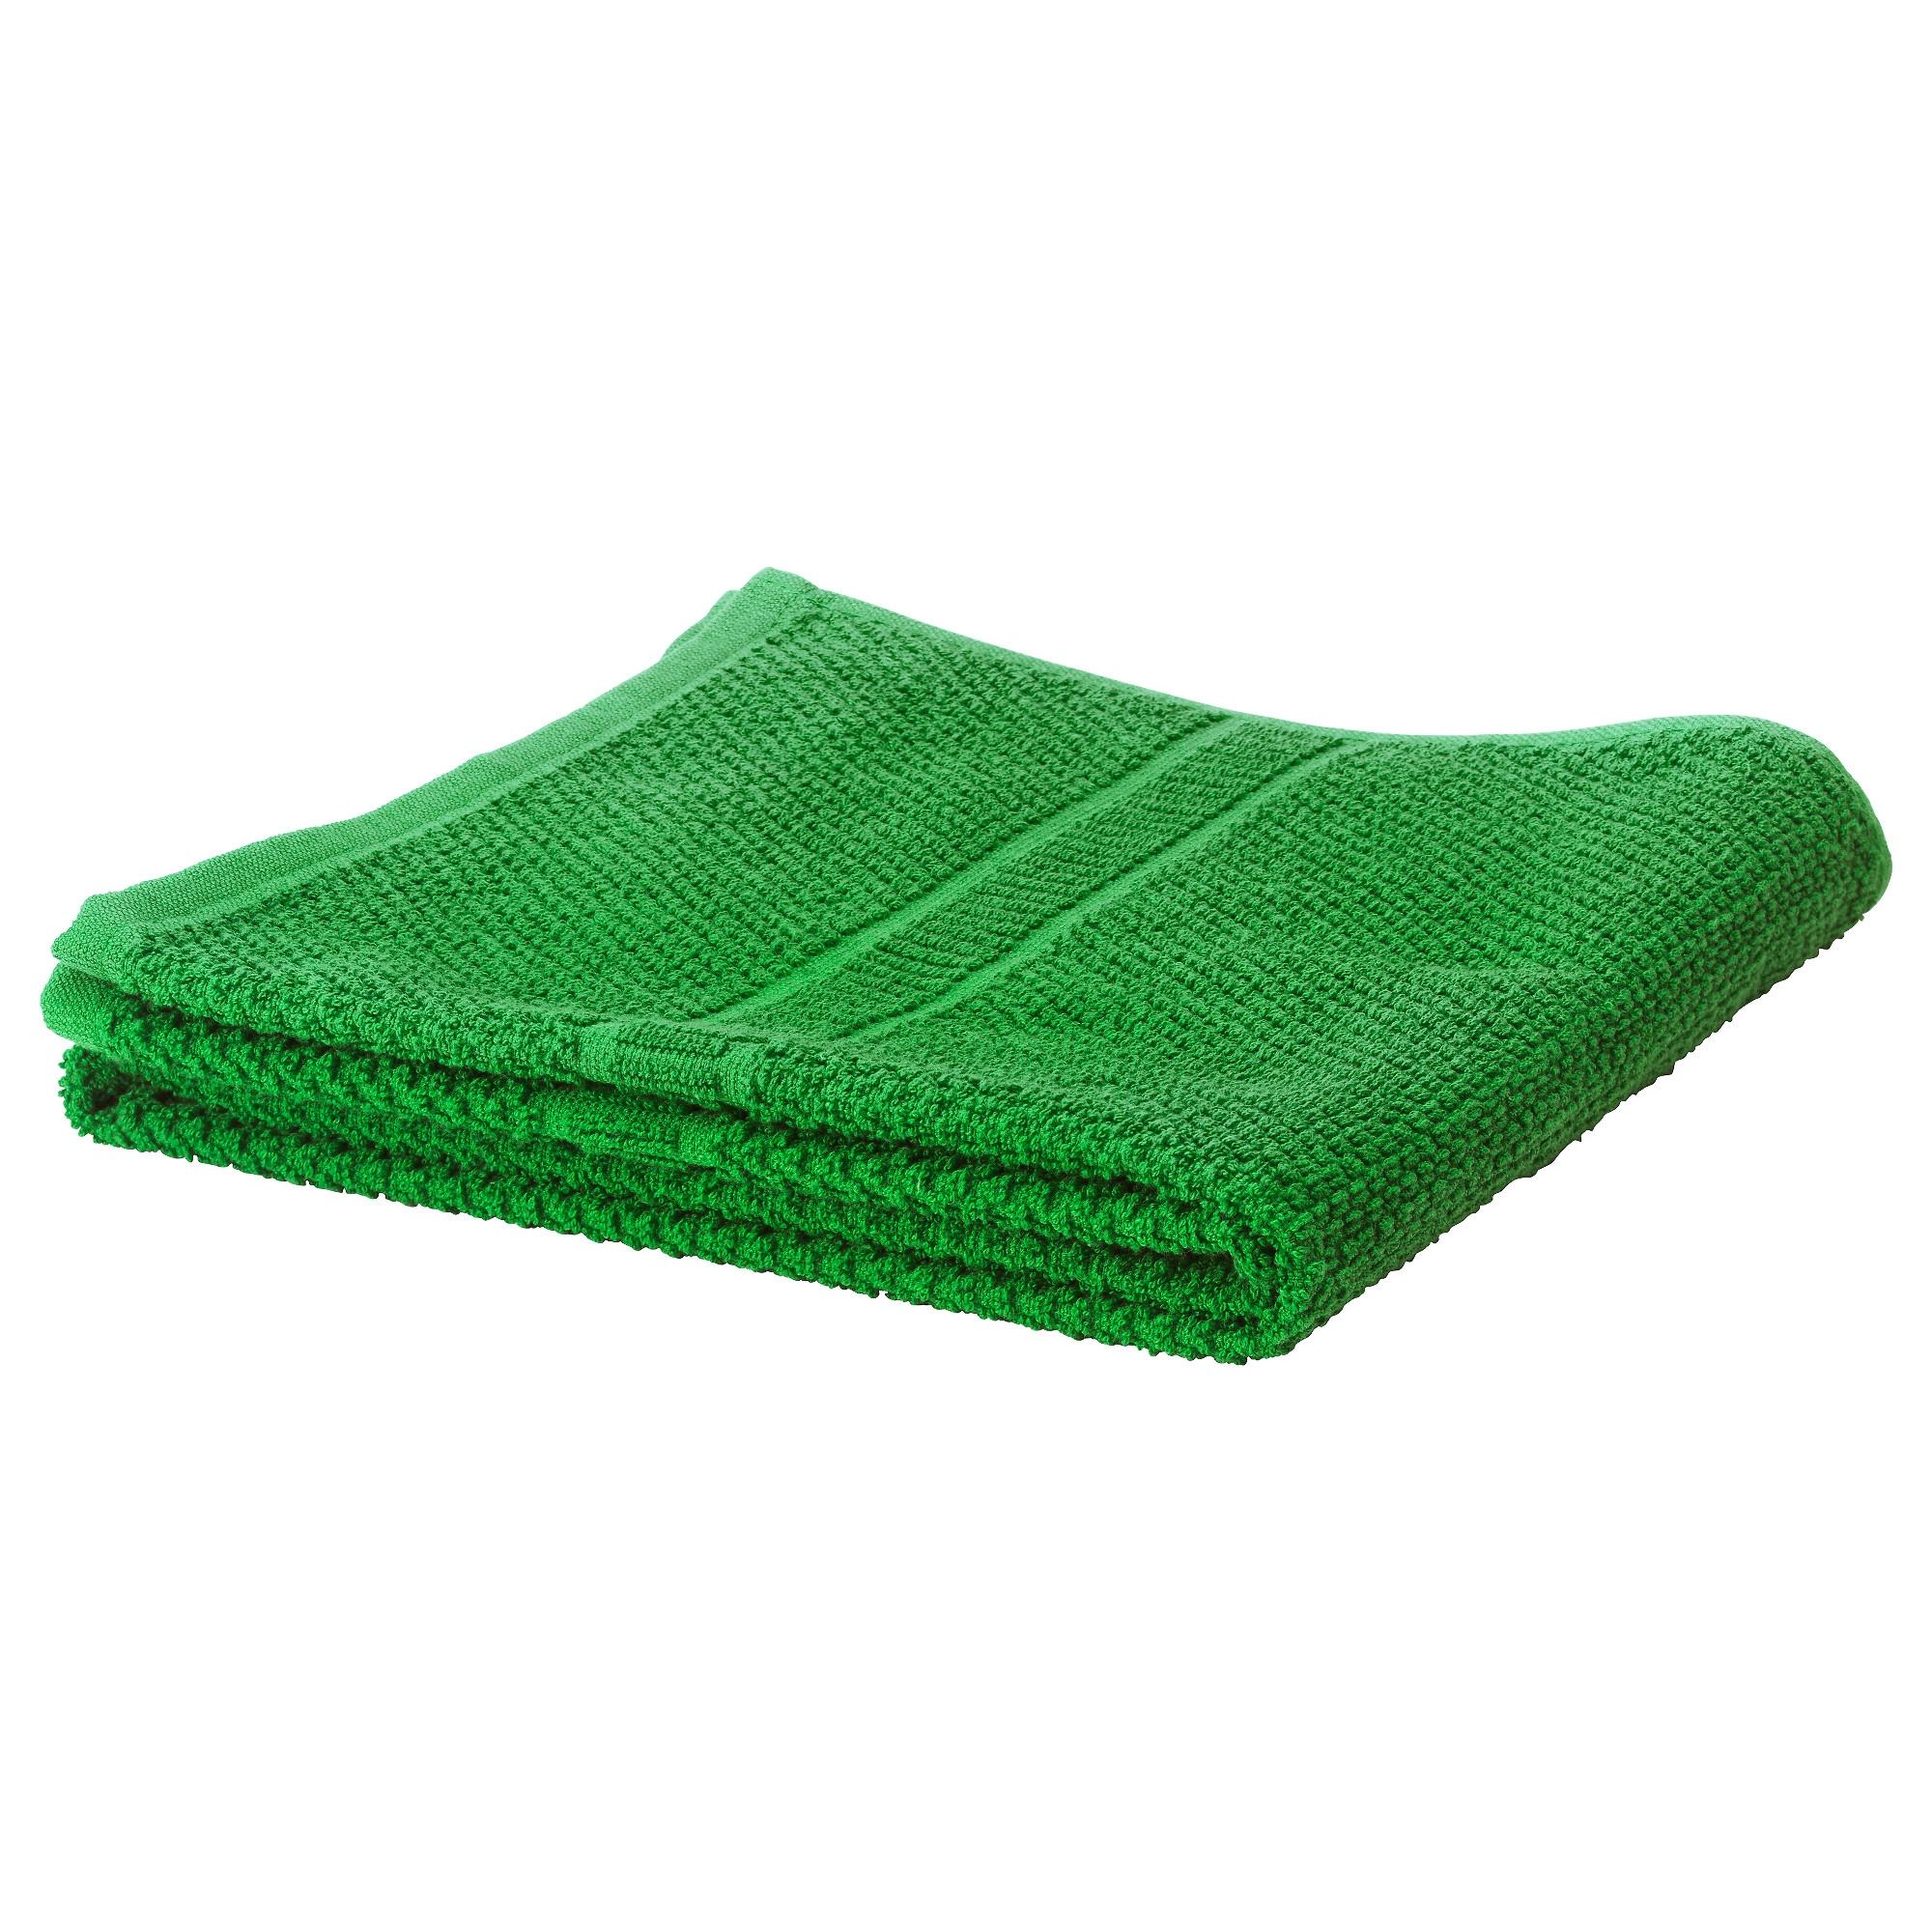 Medidas Toalla Baño Bebe:inicio textiles y decoración accesorios para baño toallas